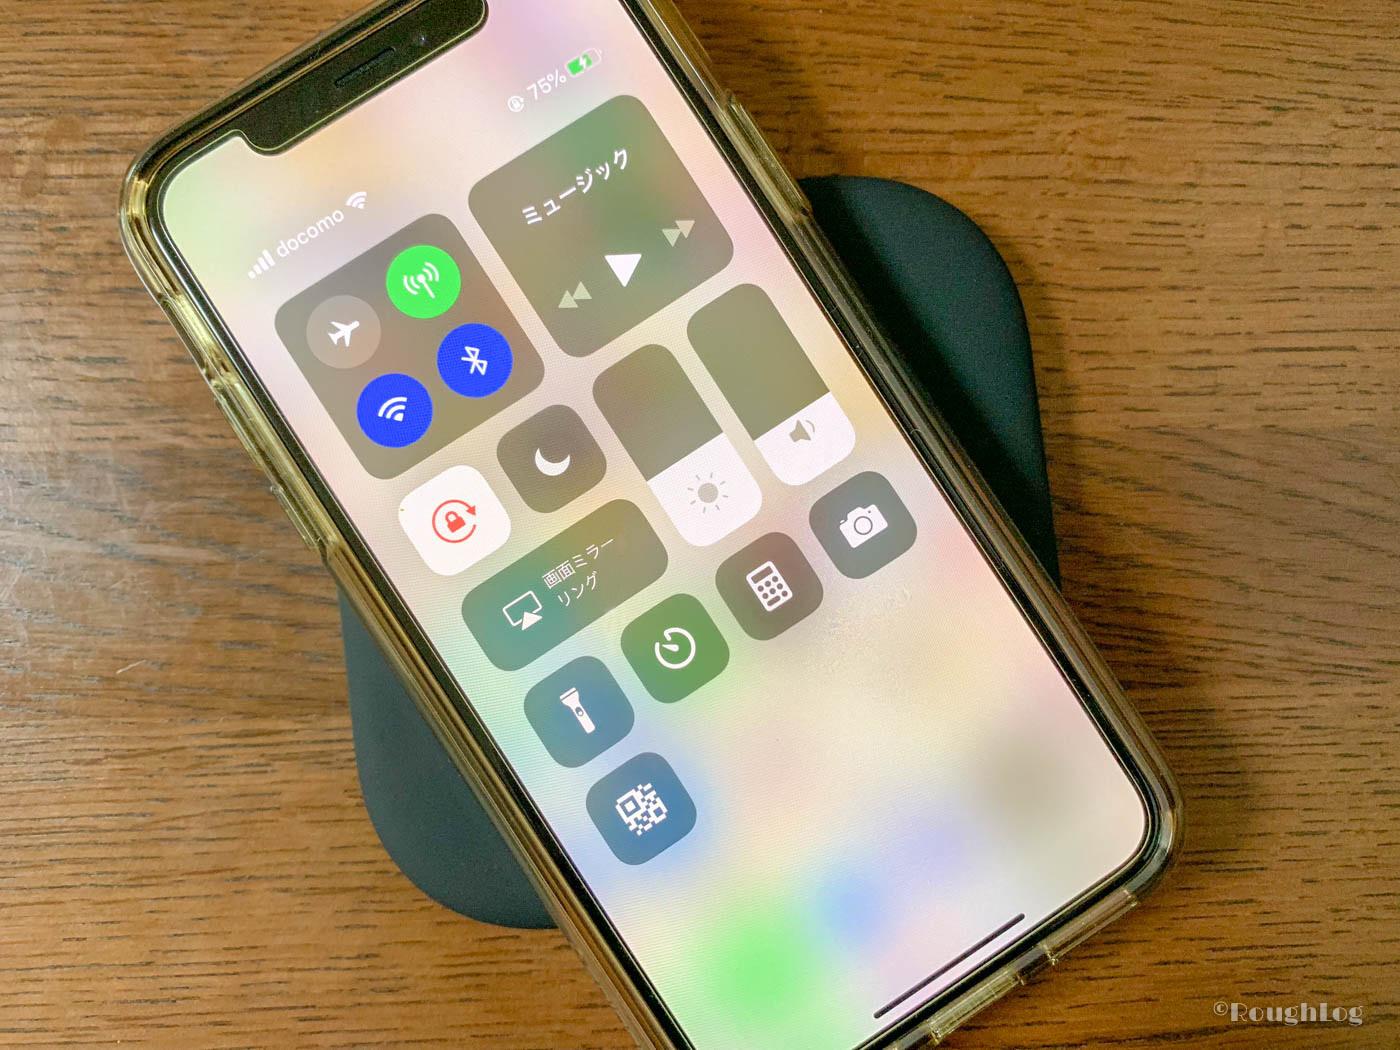 iPhoneの充電をワイヤレスで快適に。薄型でコンパクトなdodocool Qiワイヤレス充電器。